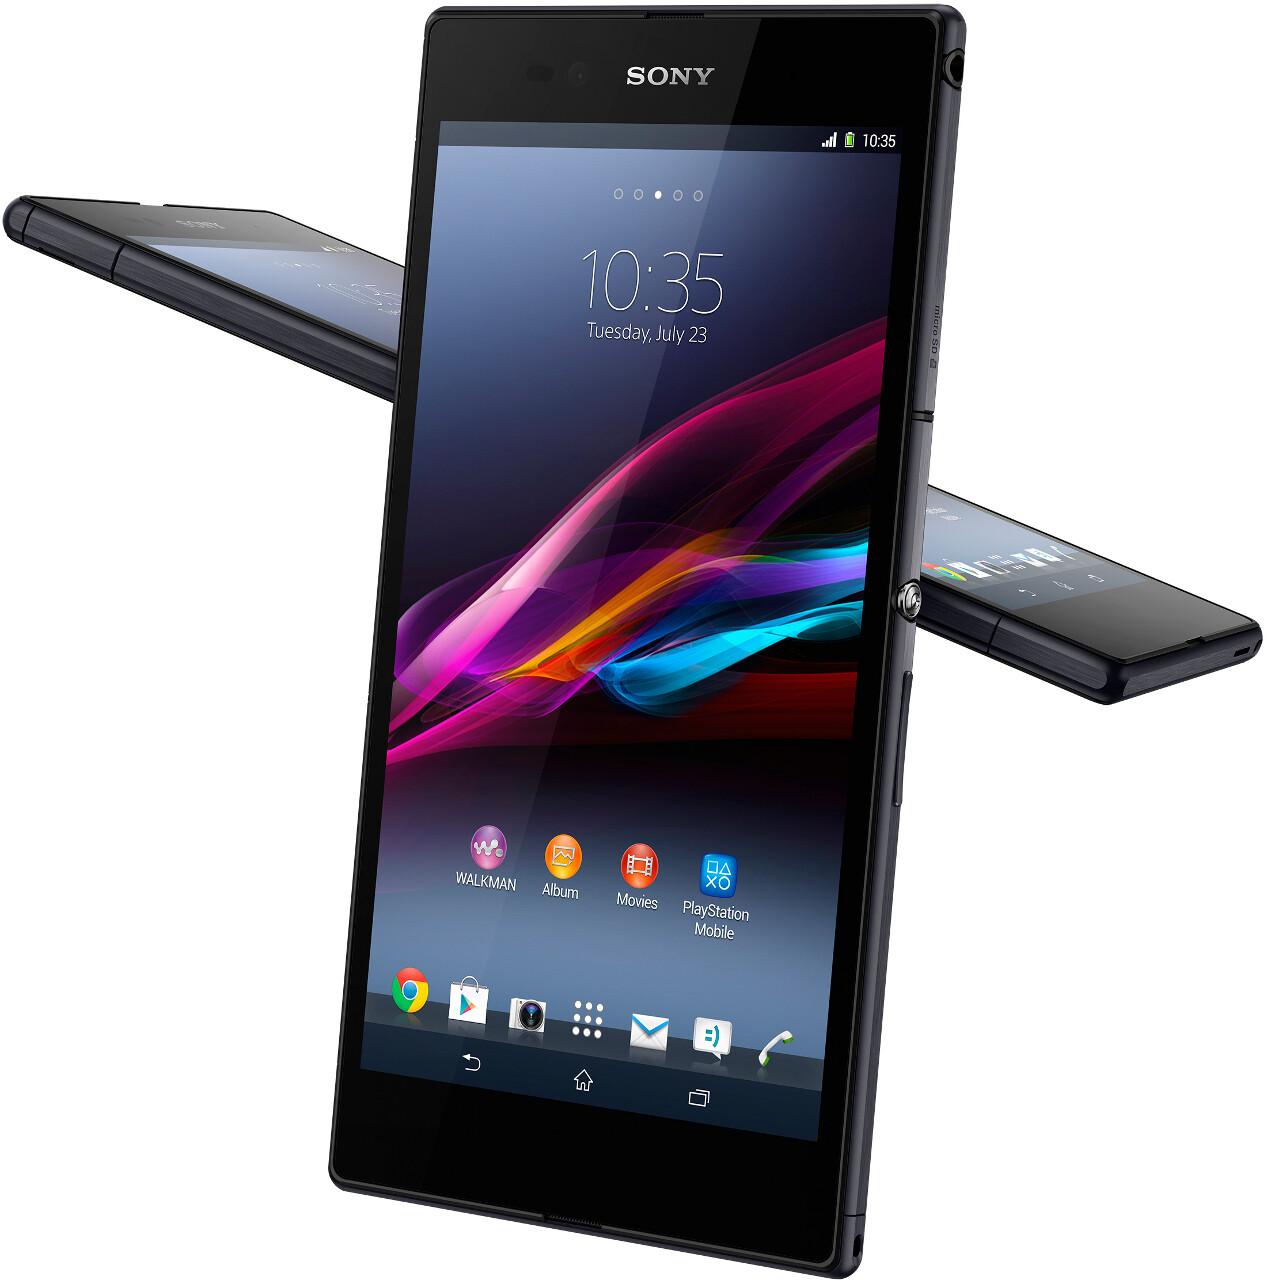 "6.4"" Sony Xperia Z Ultra unveiled"